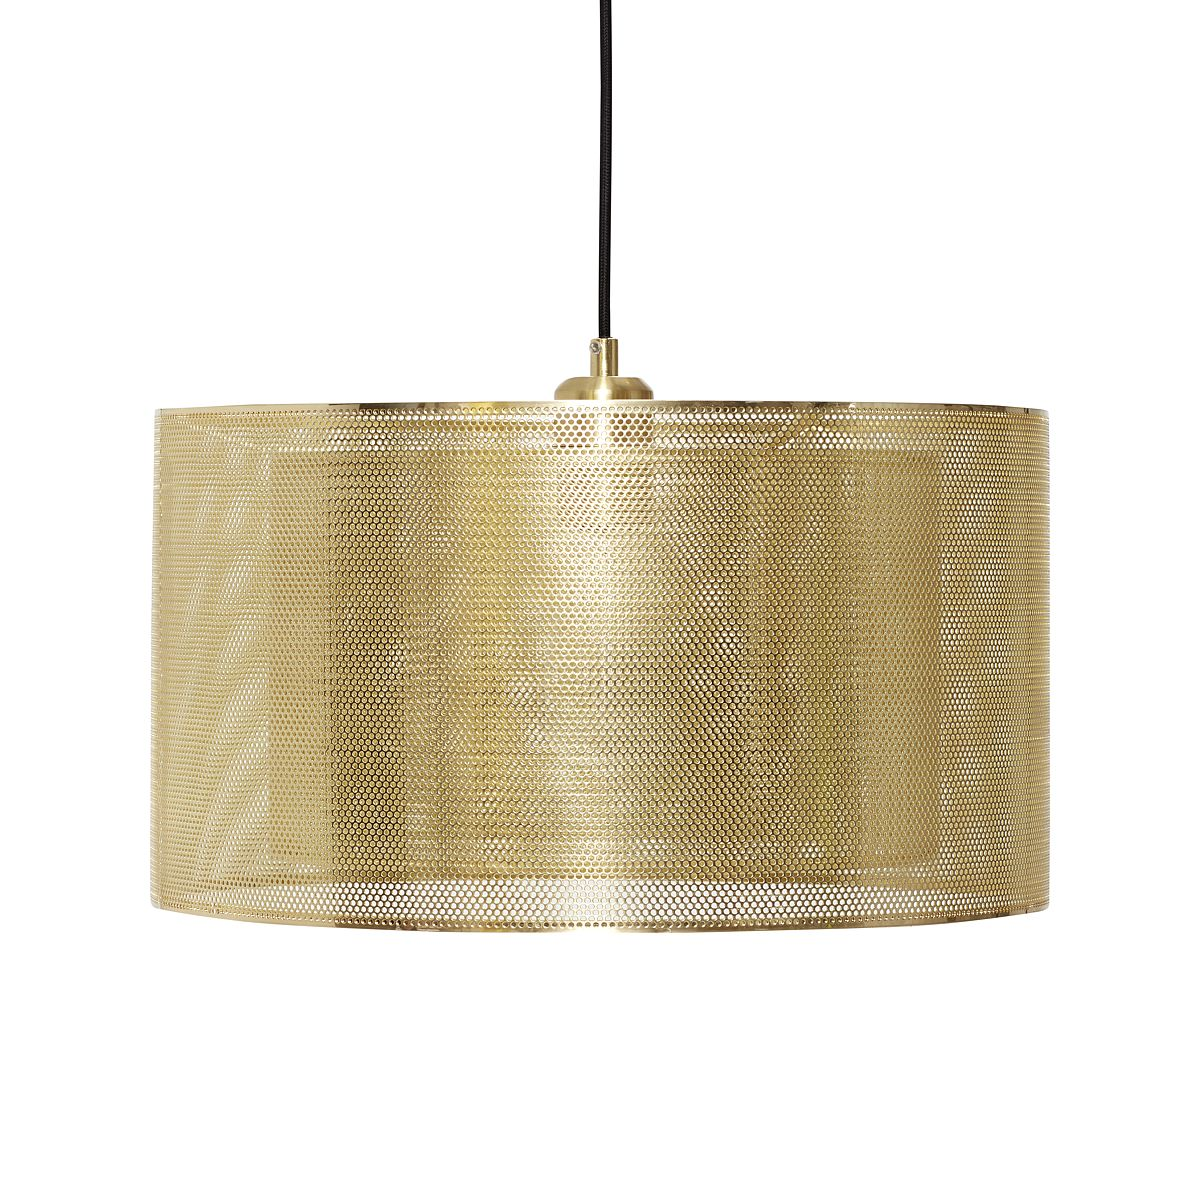 Pendant+lamp%2C+brass